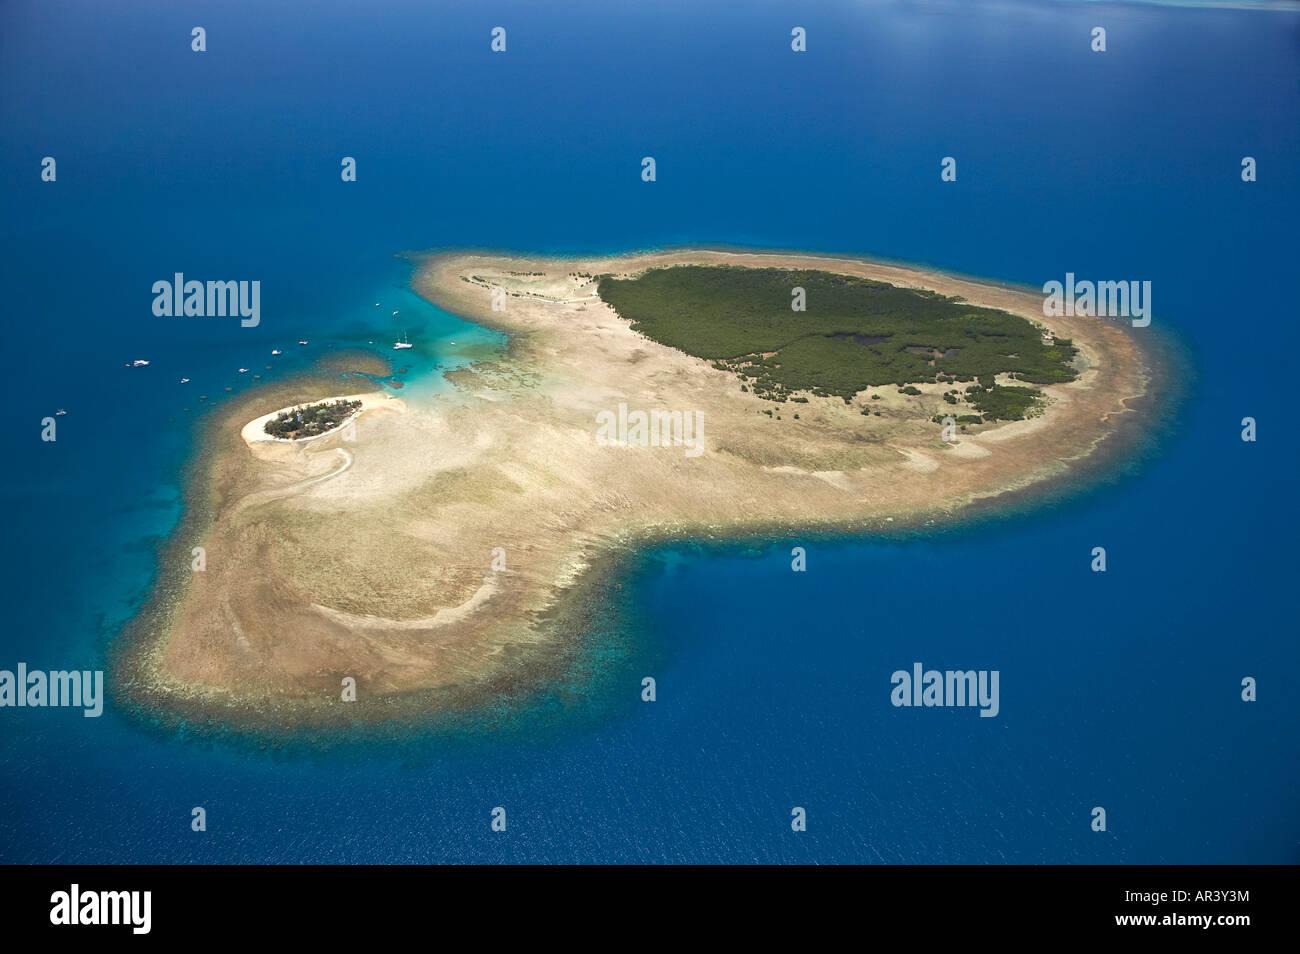 Port Douglas Karte.Karte Von Australien Stockfotos Karte Von Australien